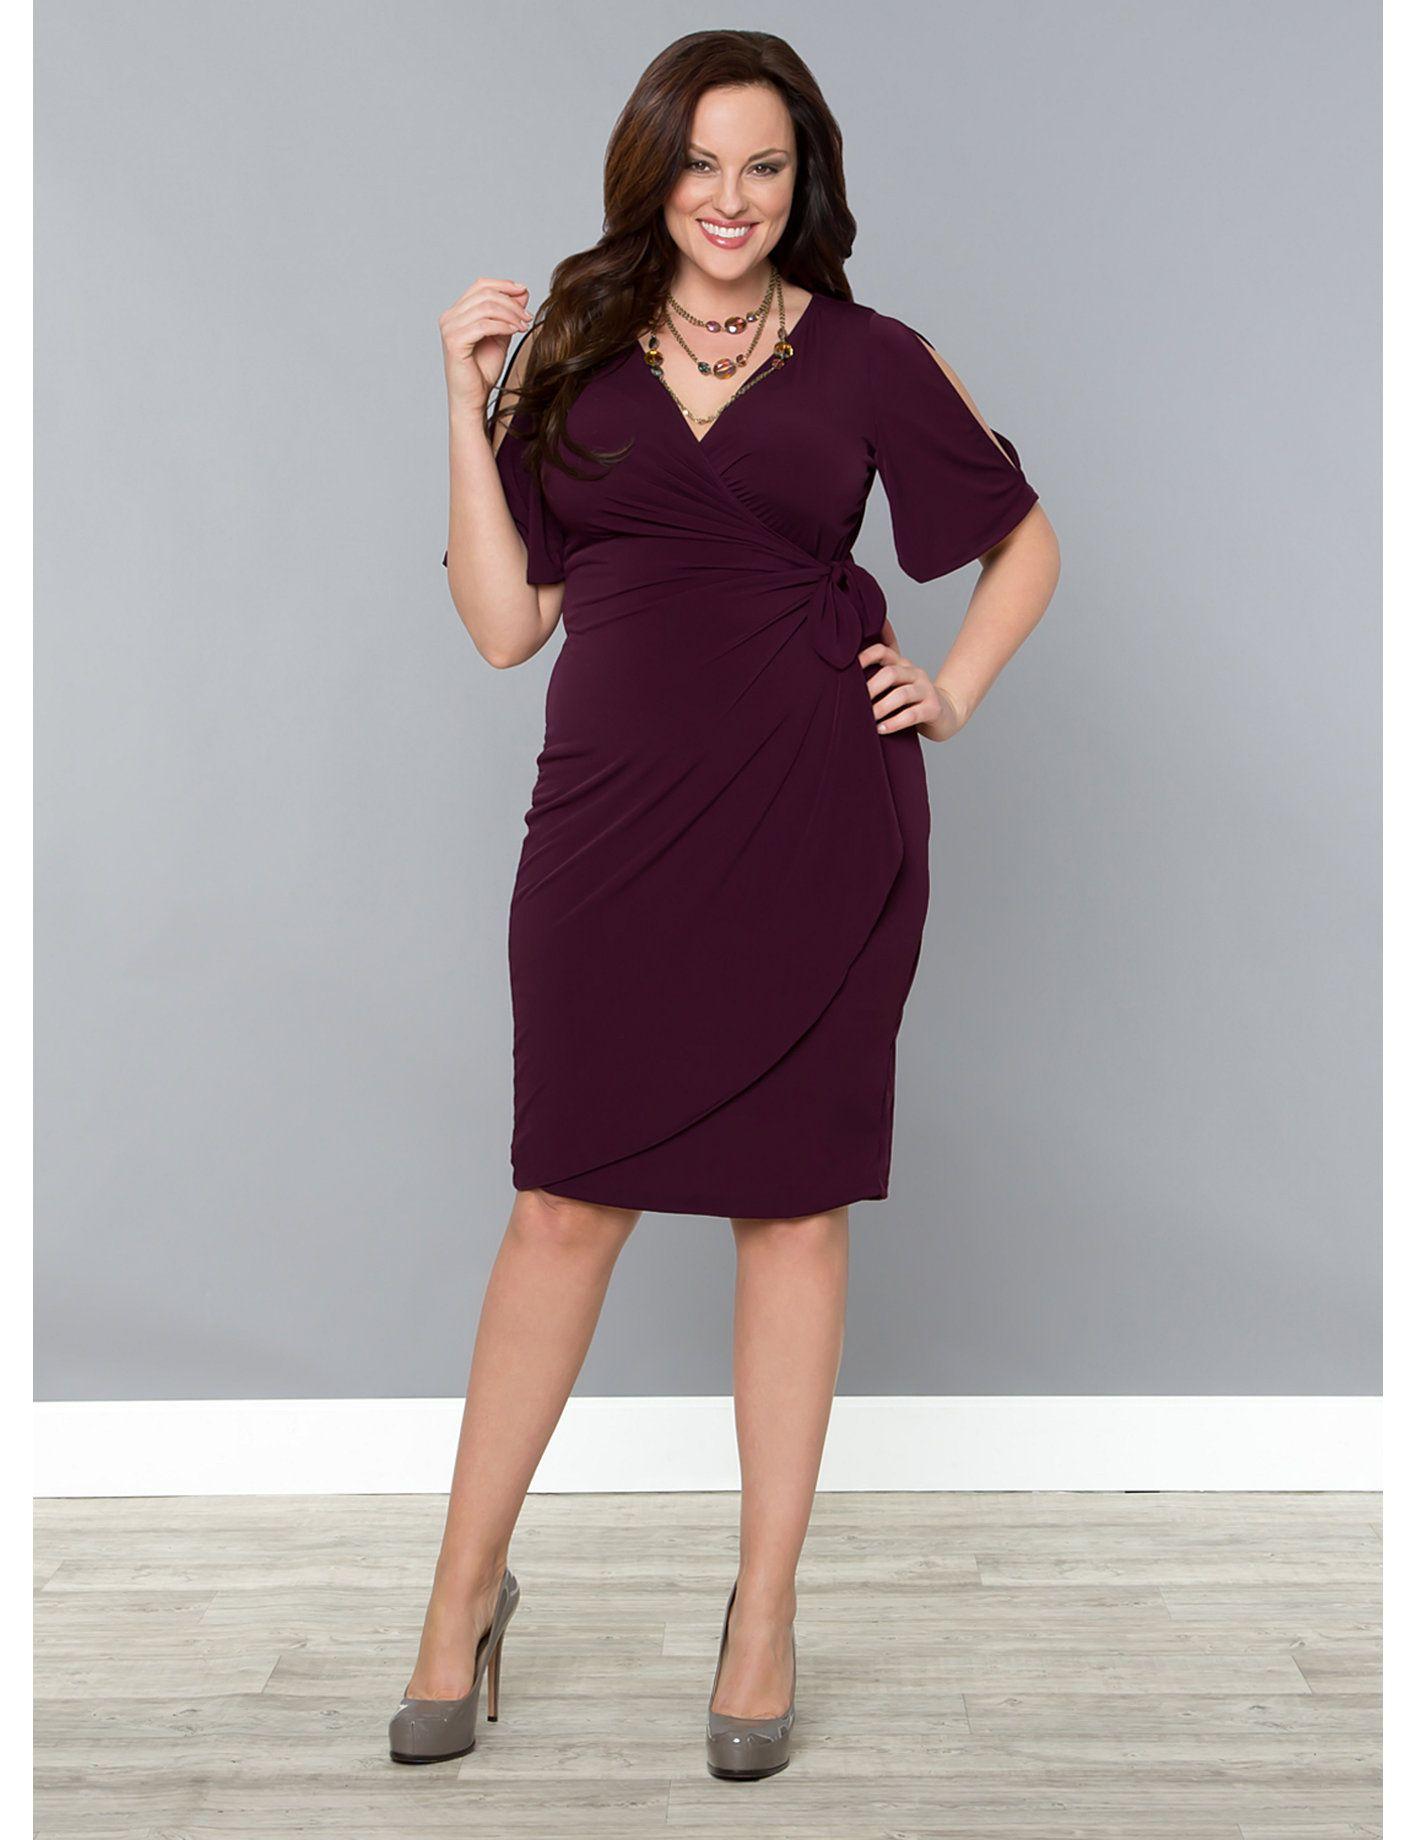 Plus Size Career Dresses & Plus Size Work Dresses | Lane ...